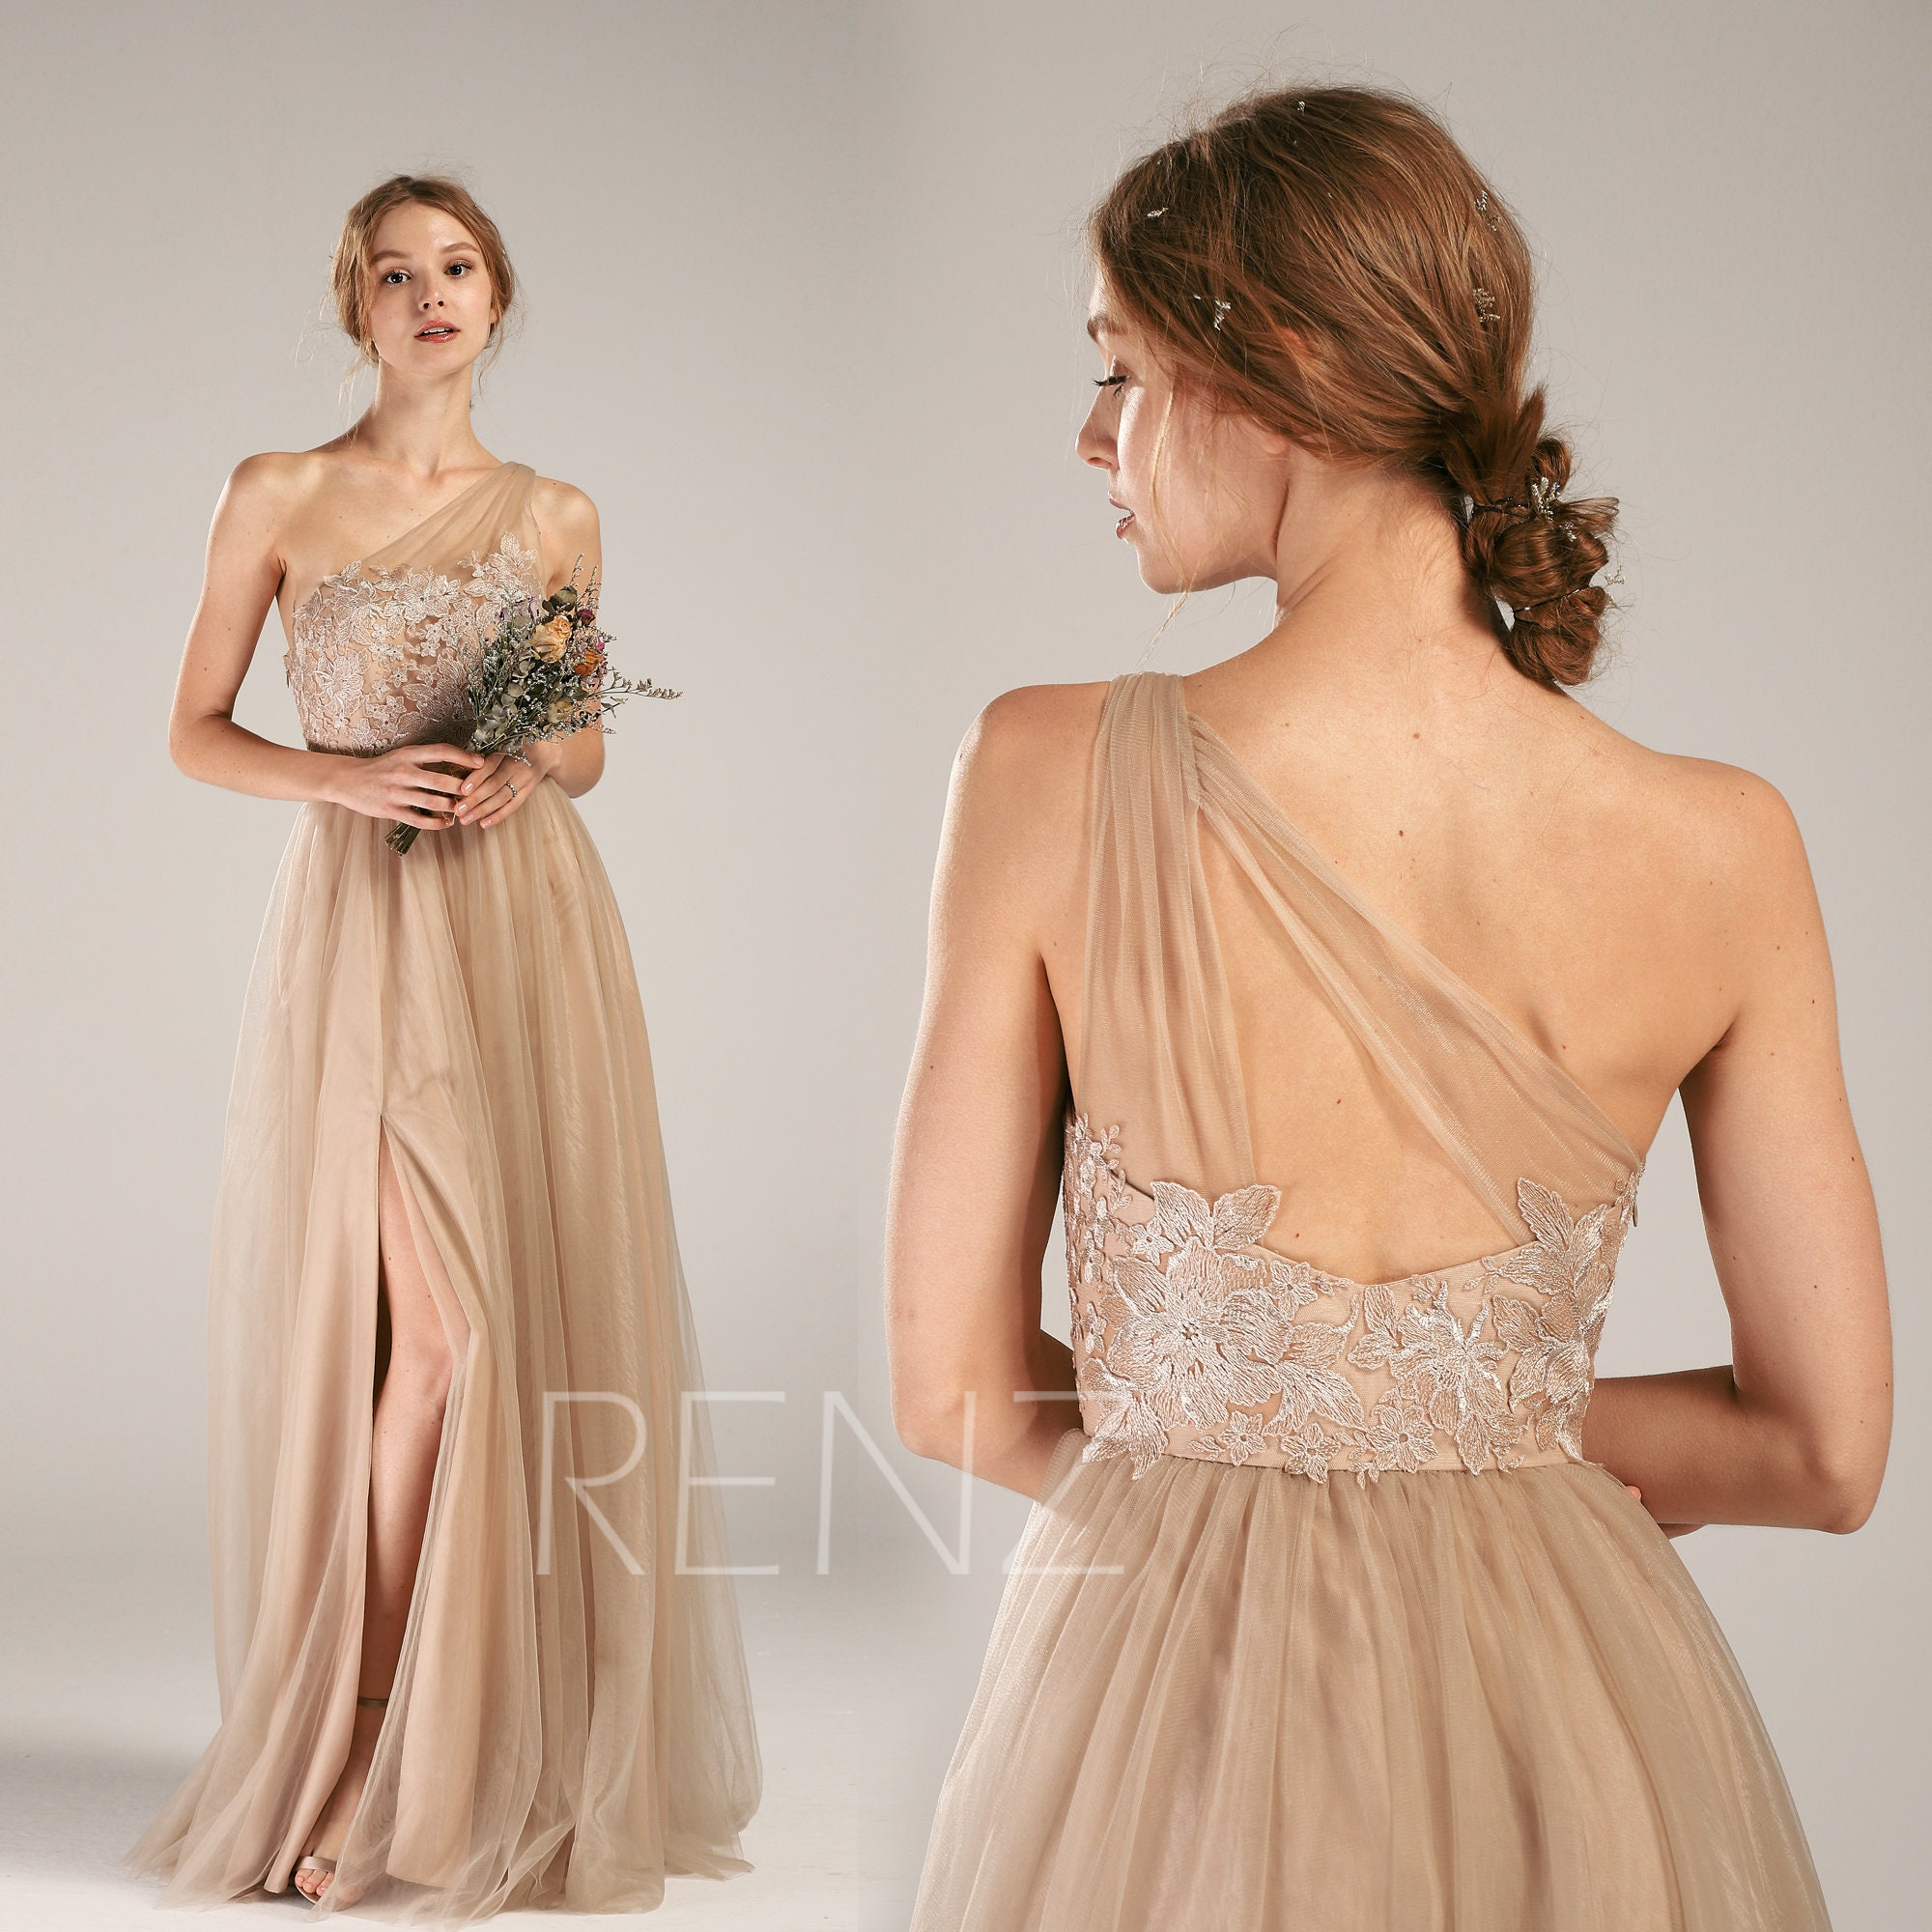 51c8b06a793 Bridesmaid Dress Pale Khaki Tulle Prom Dress One Shoulder